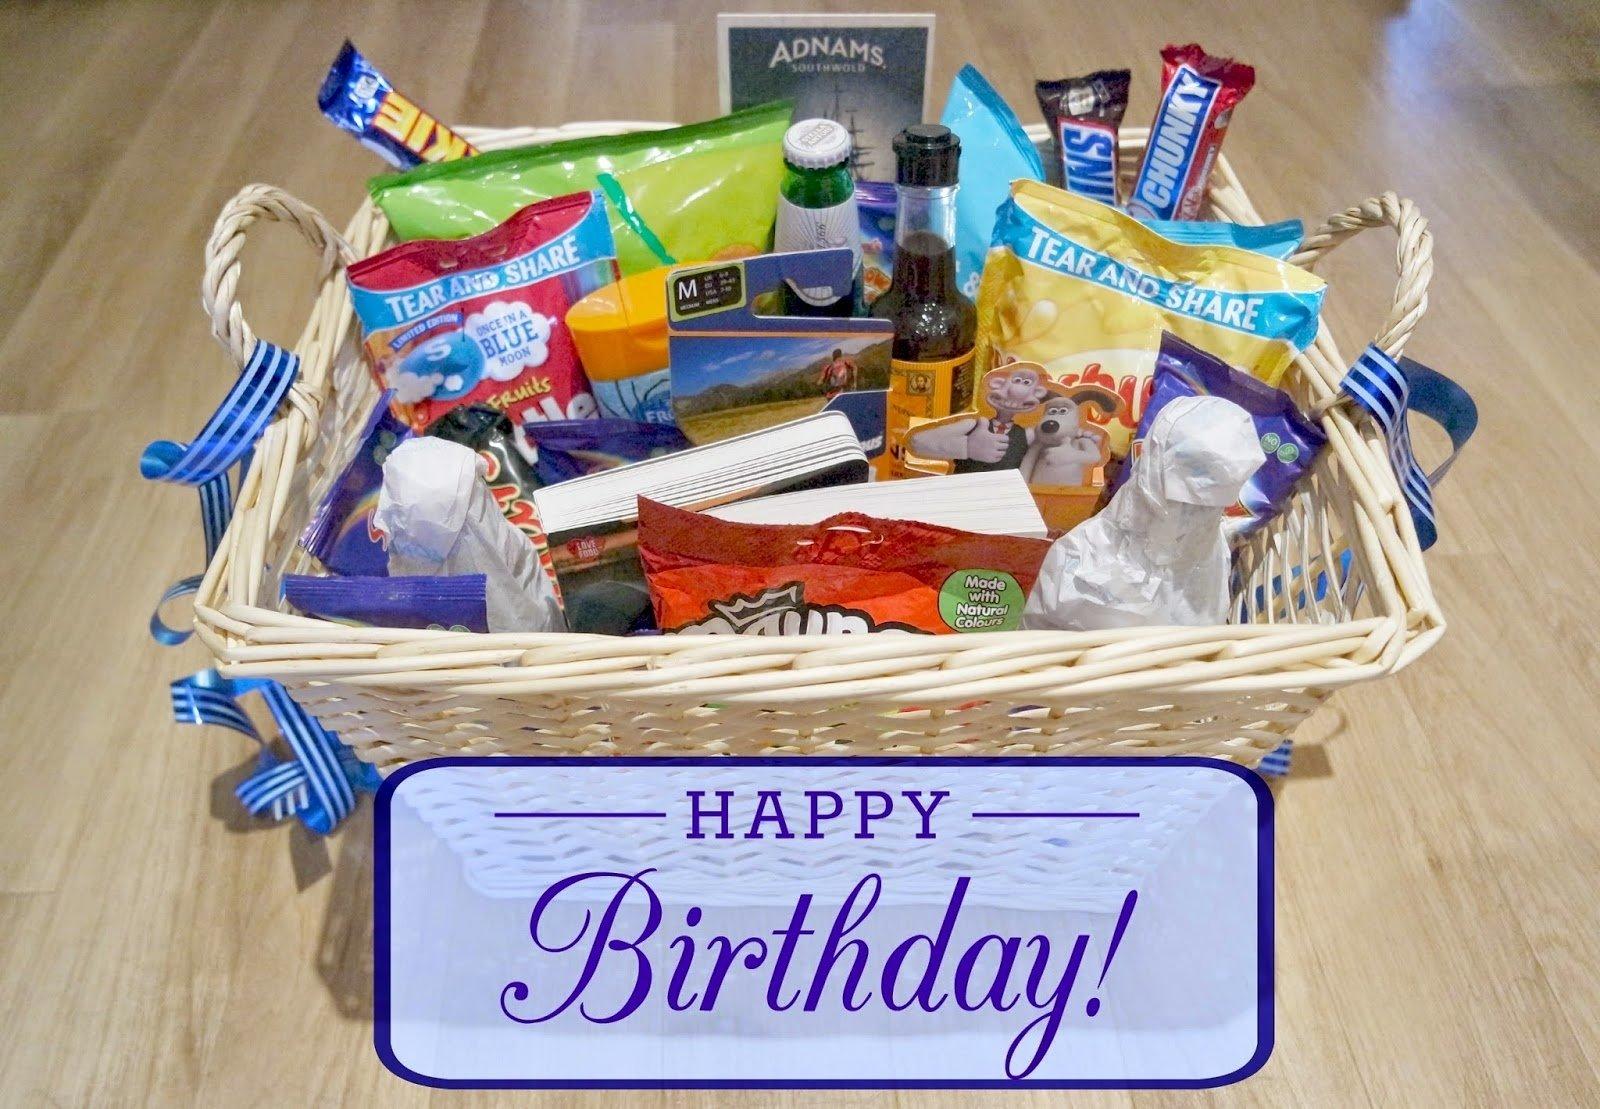 10 Nice Mens 50Th Birthday Gift Ideas uptown peach my dads 50th birthday hamper mens gift ideas 20 2021